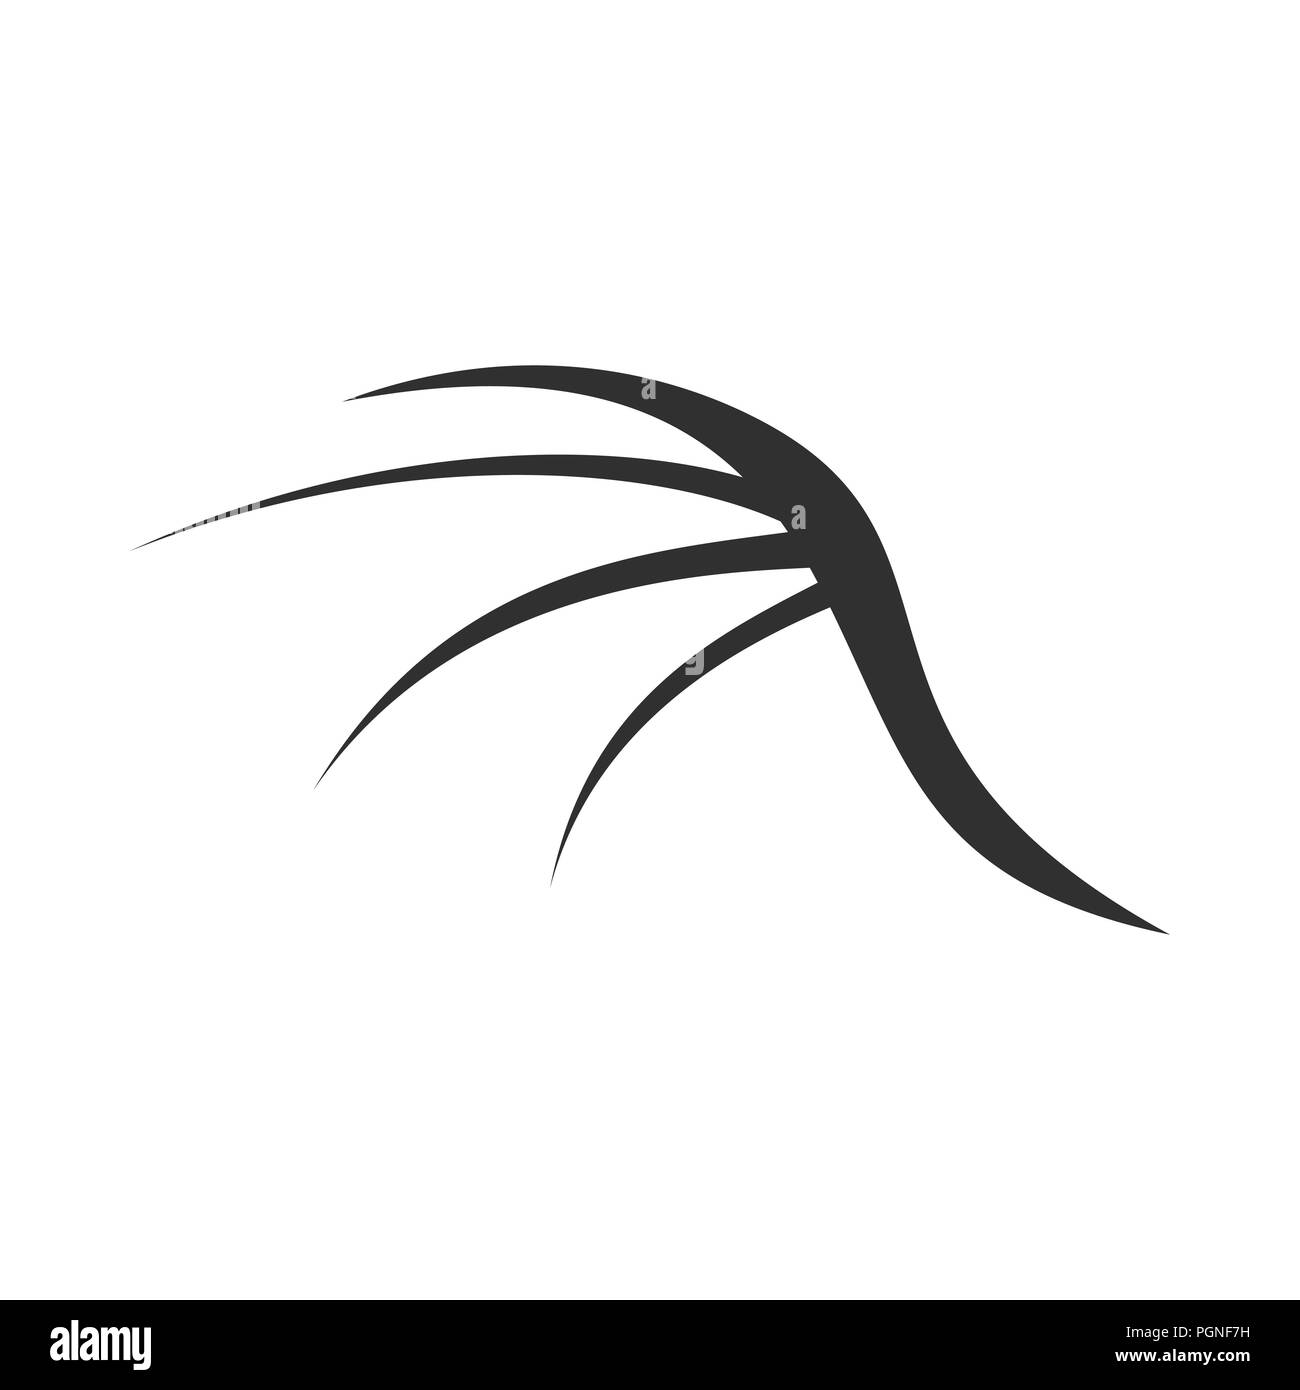 Abstract Dragon Wing Shape Vektor Symbol Grafik Logo Design Template